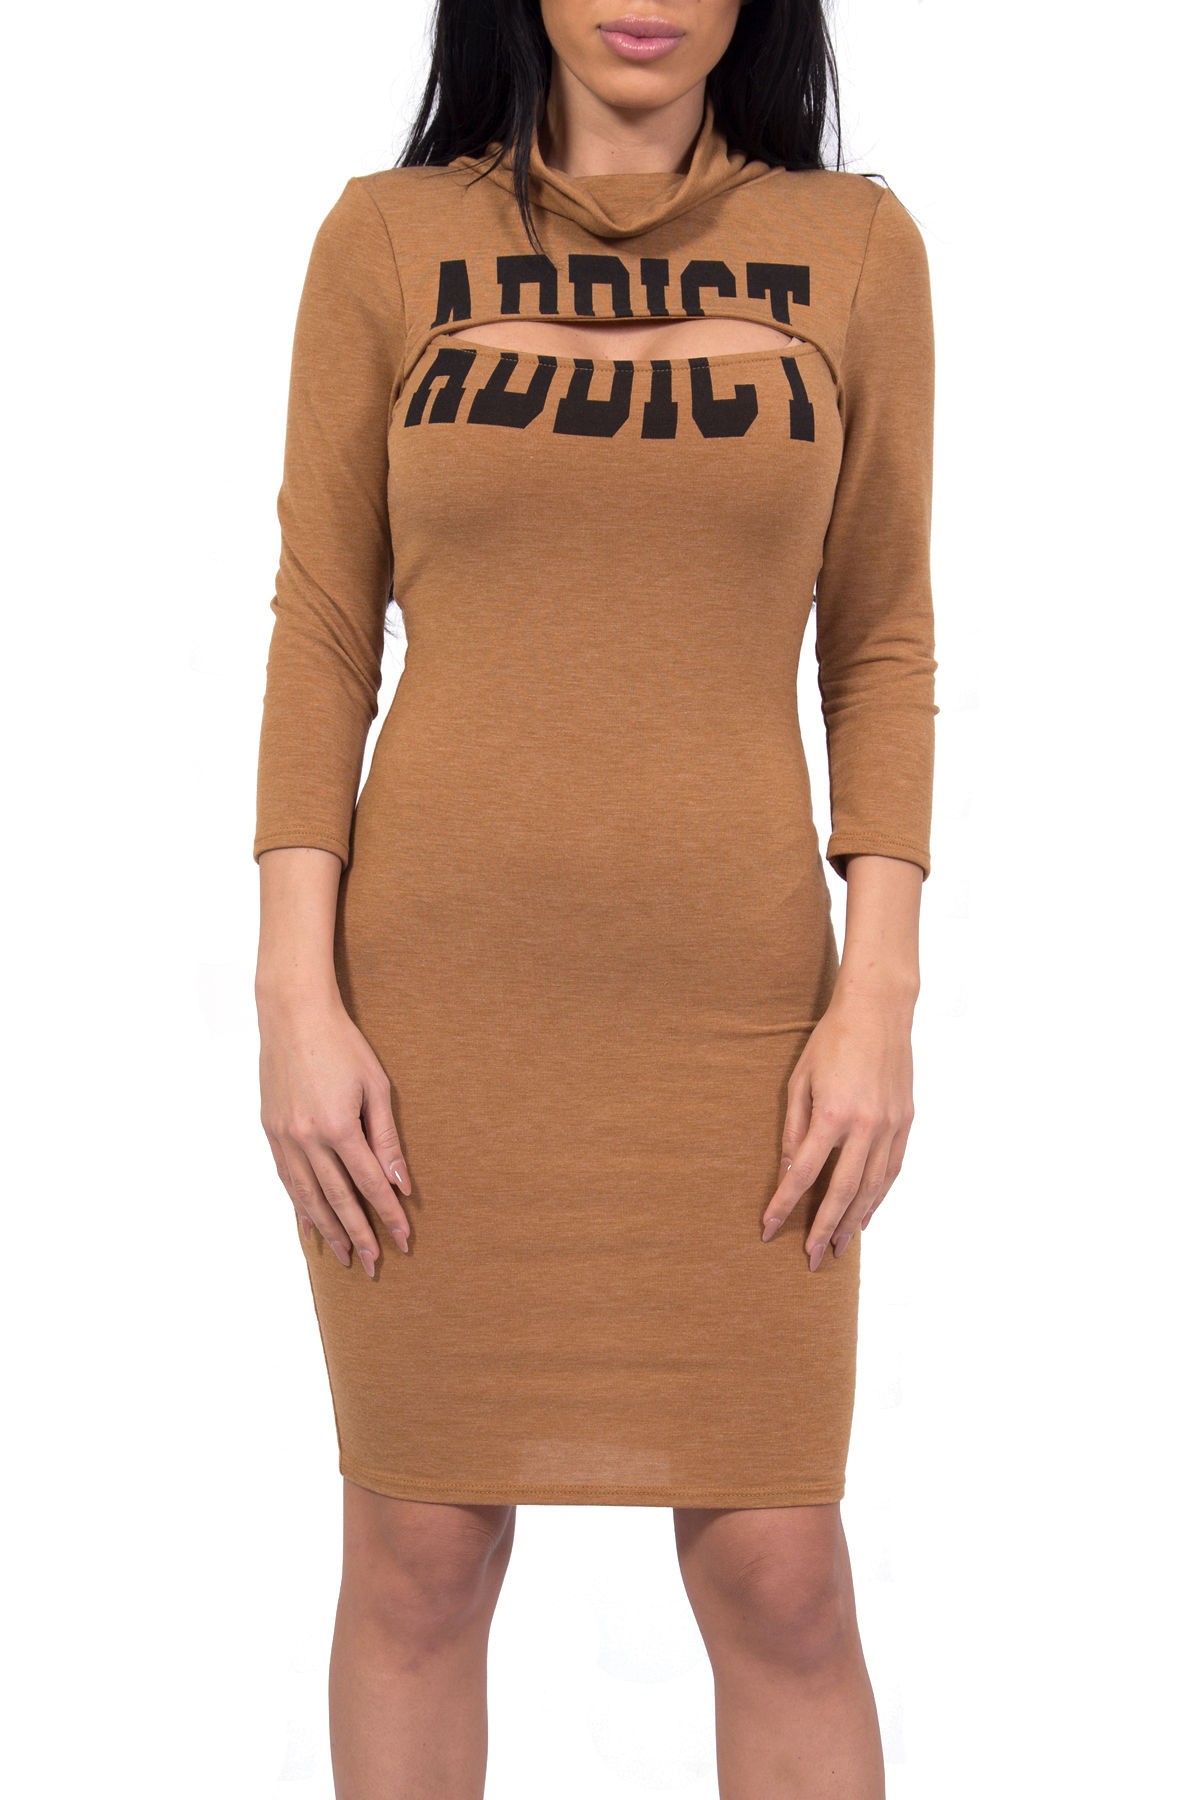 Image of Addict Slit Dress in Brown